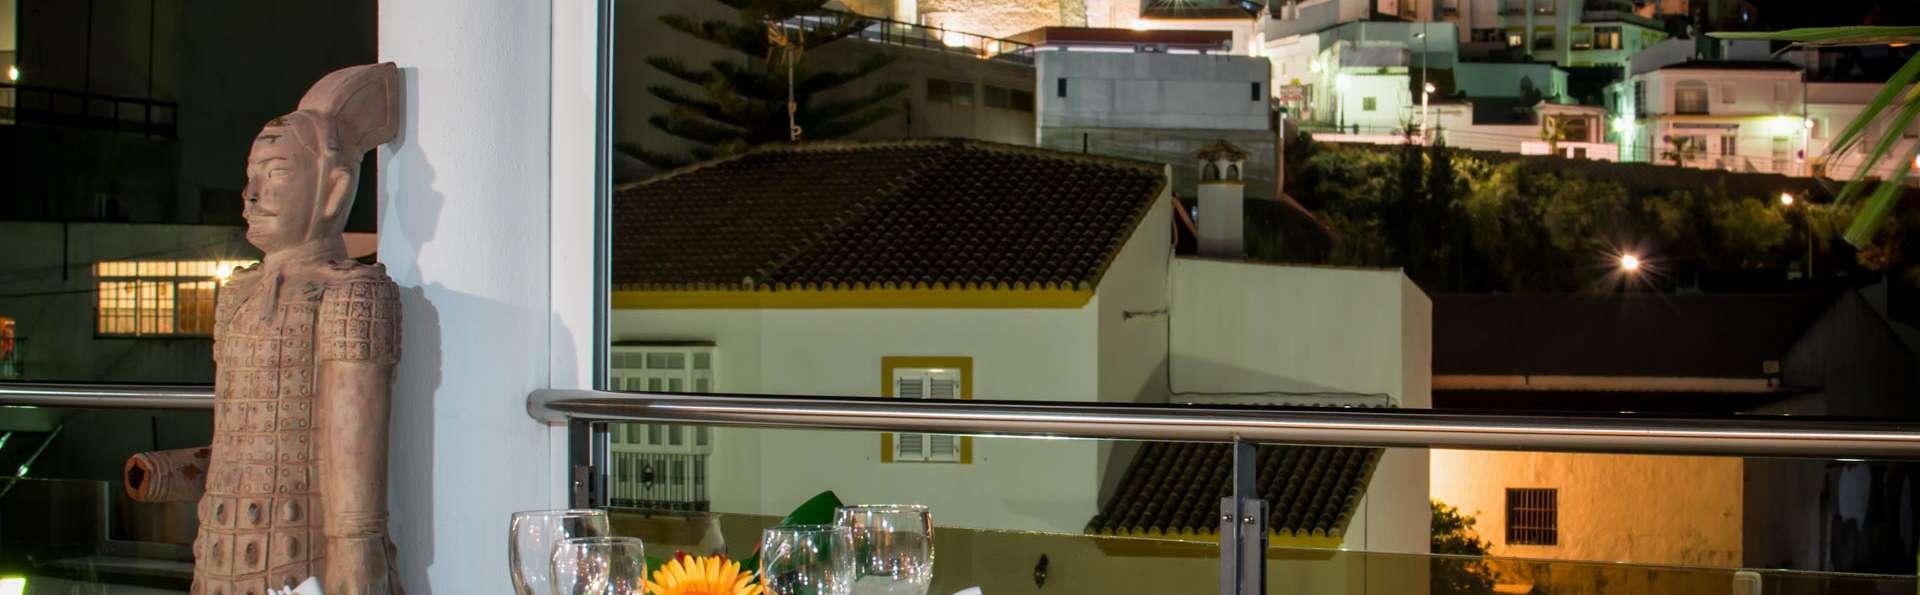 Ele Hotel Spa Medina Sidonia - EDIT_RESTAURANT_01.jpg